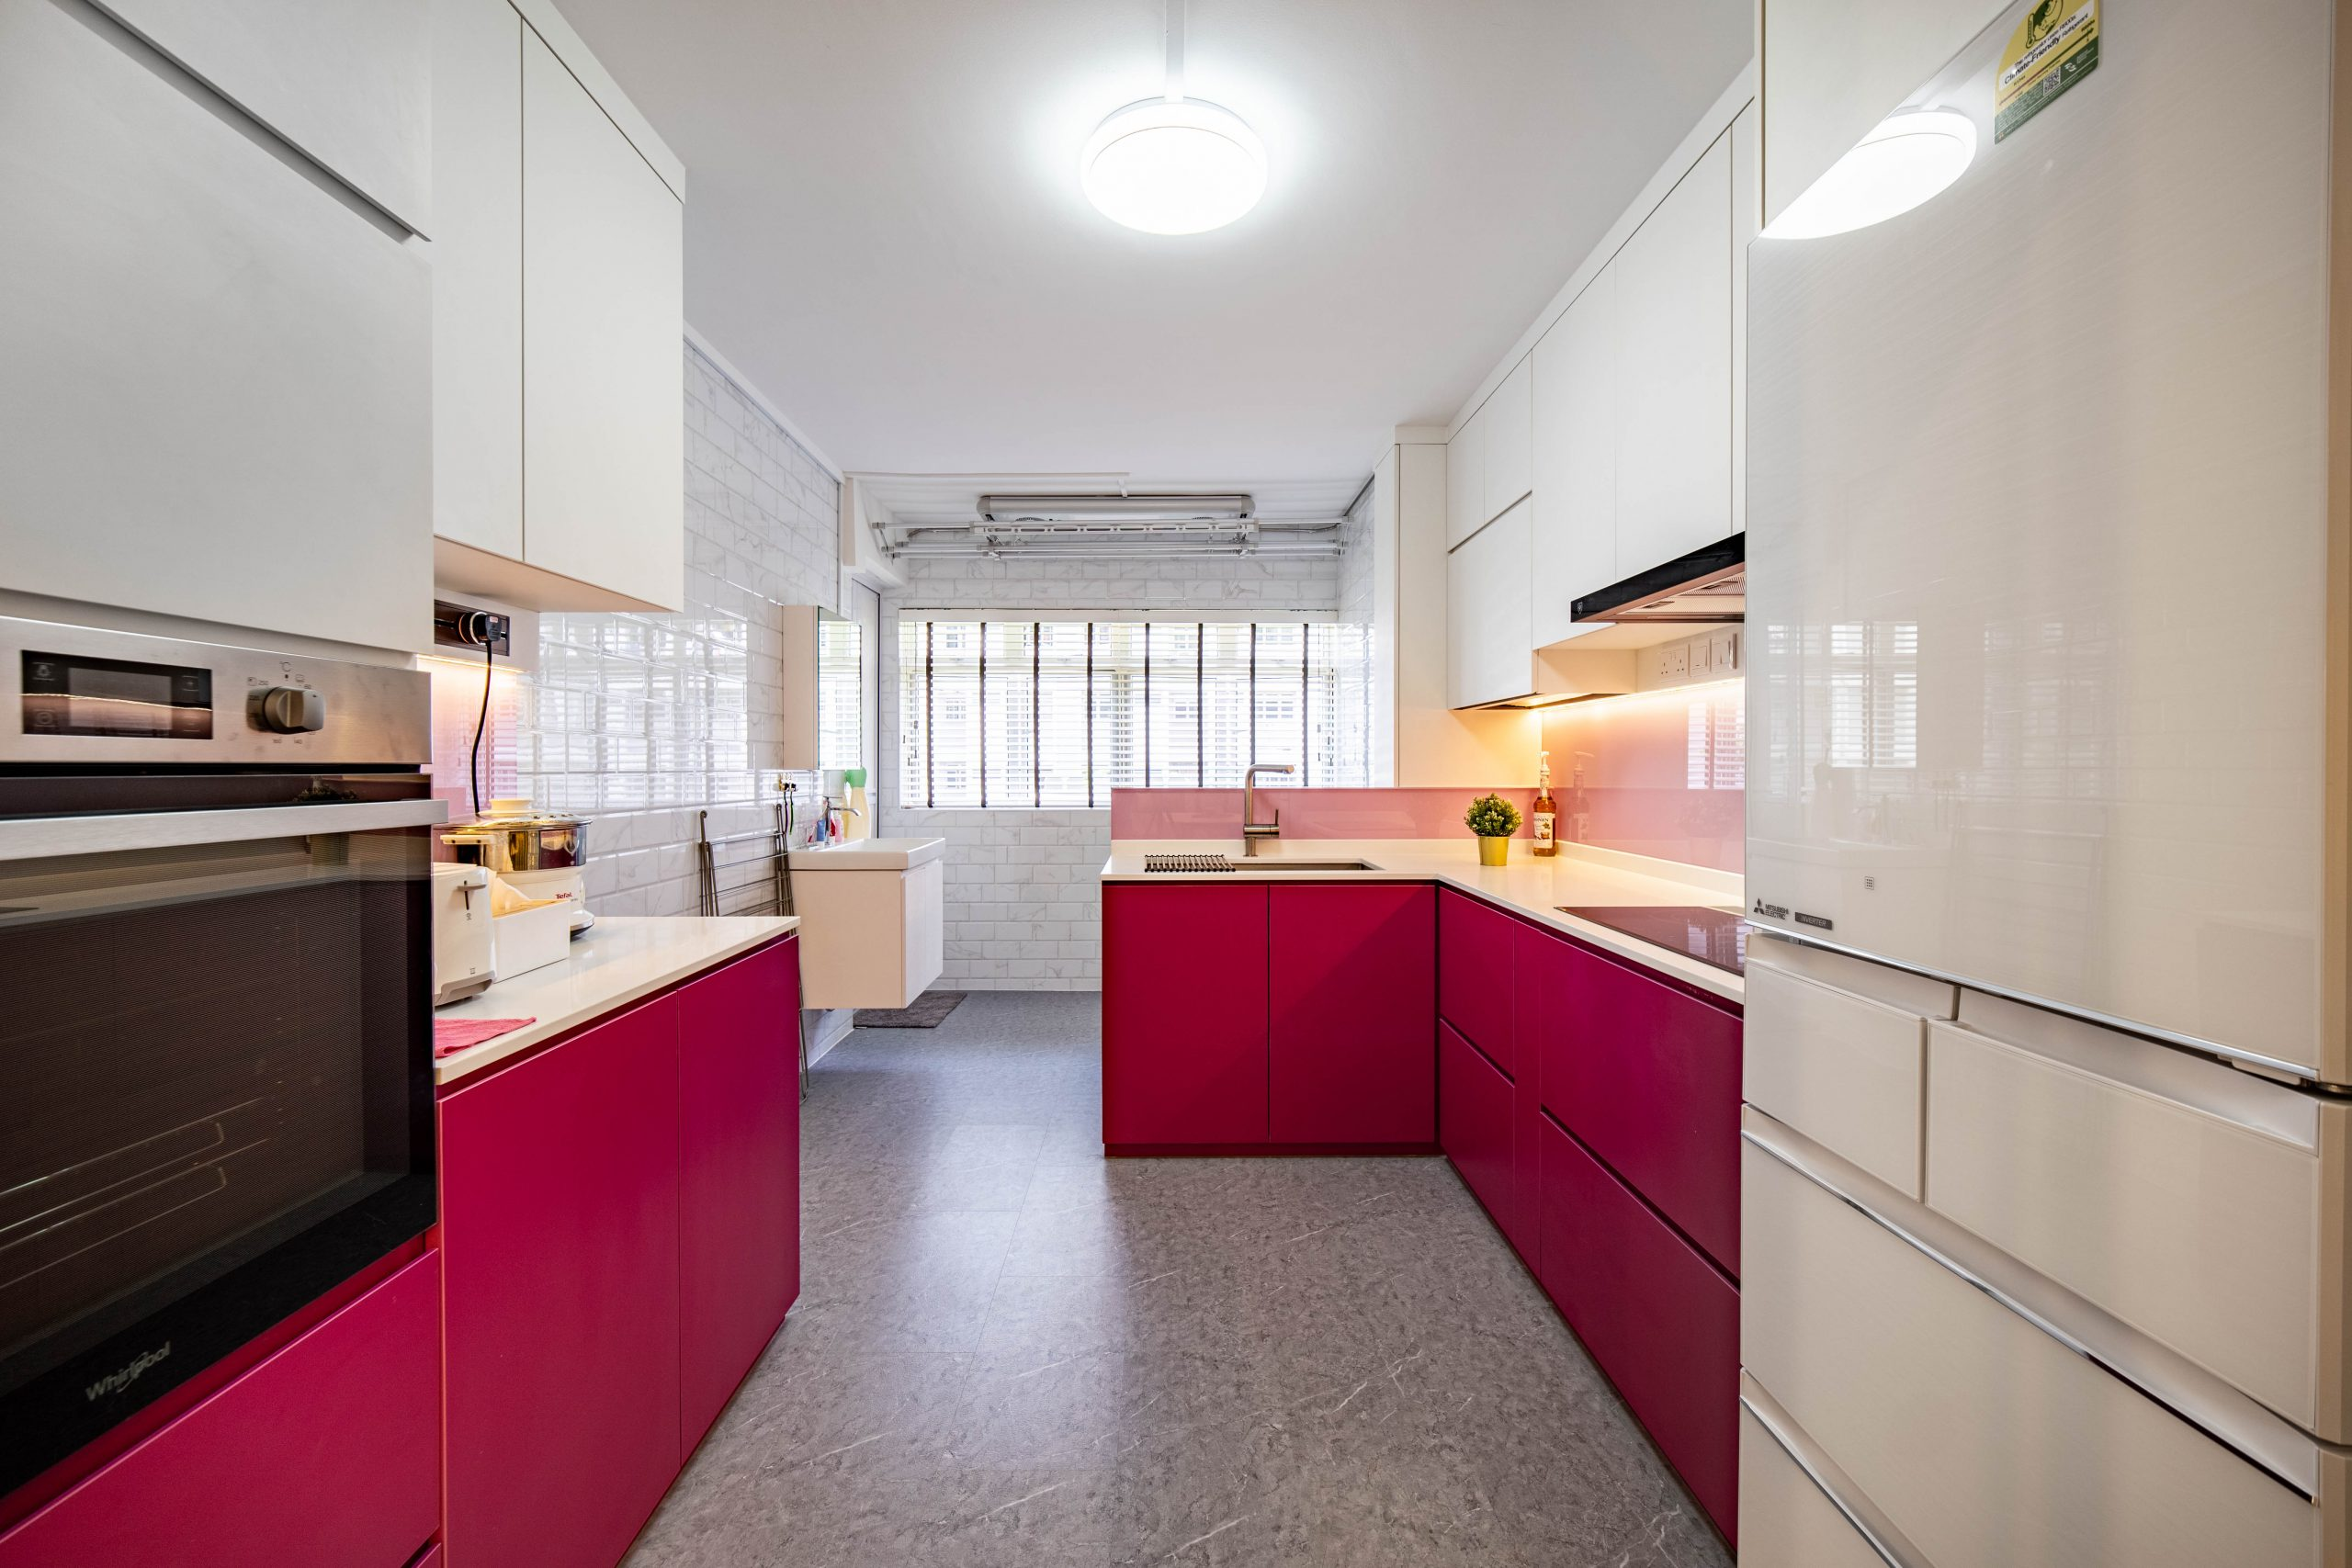 8 Trending Kitchen Design Ideas for HDB